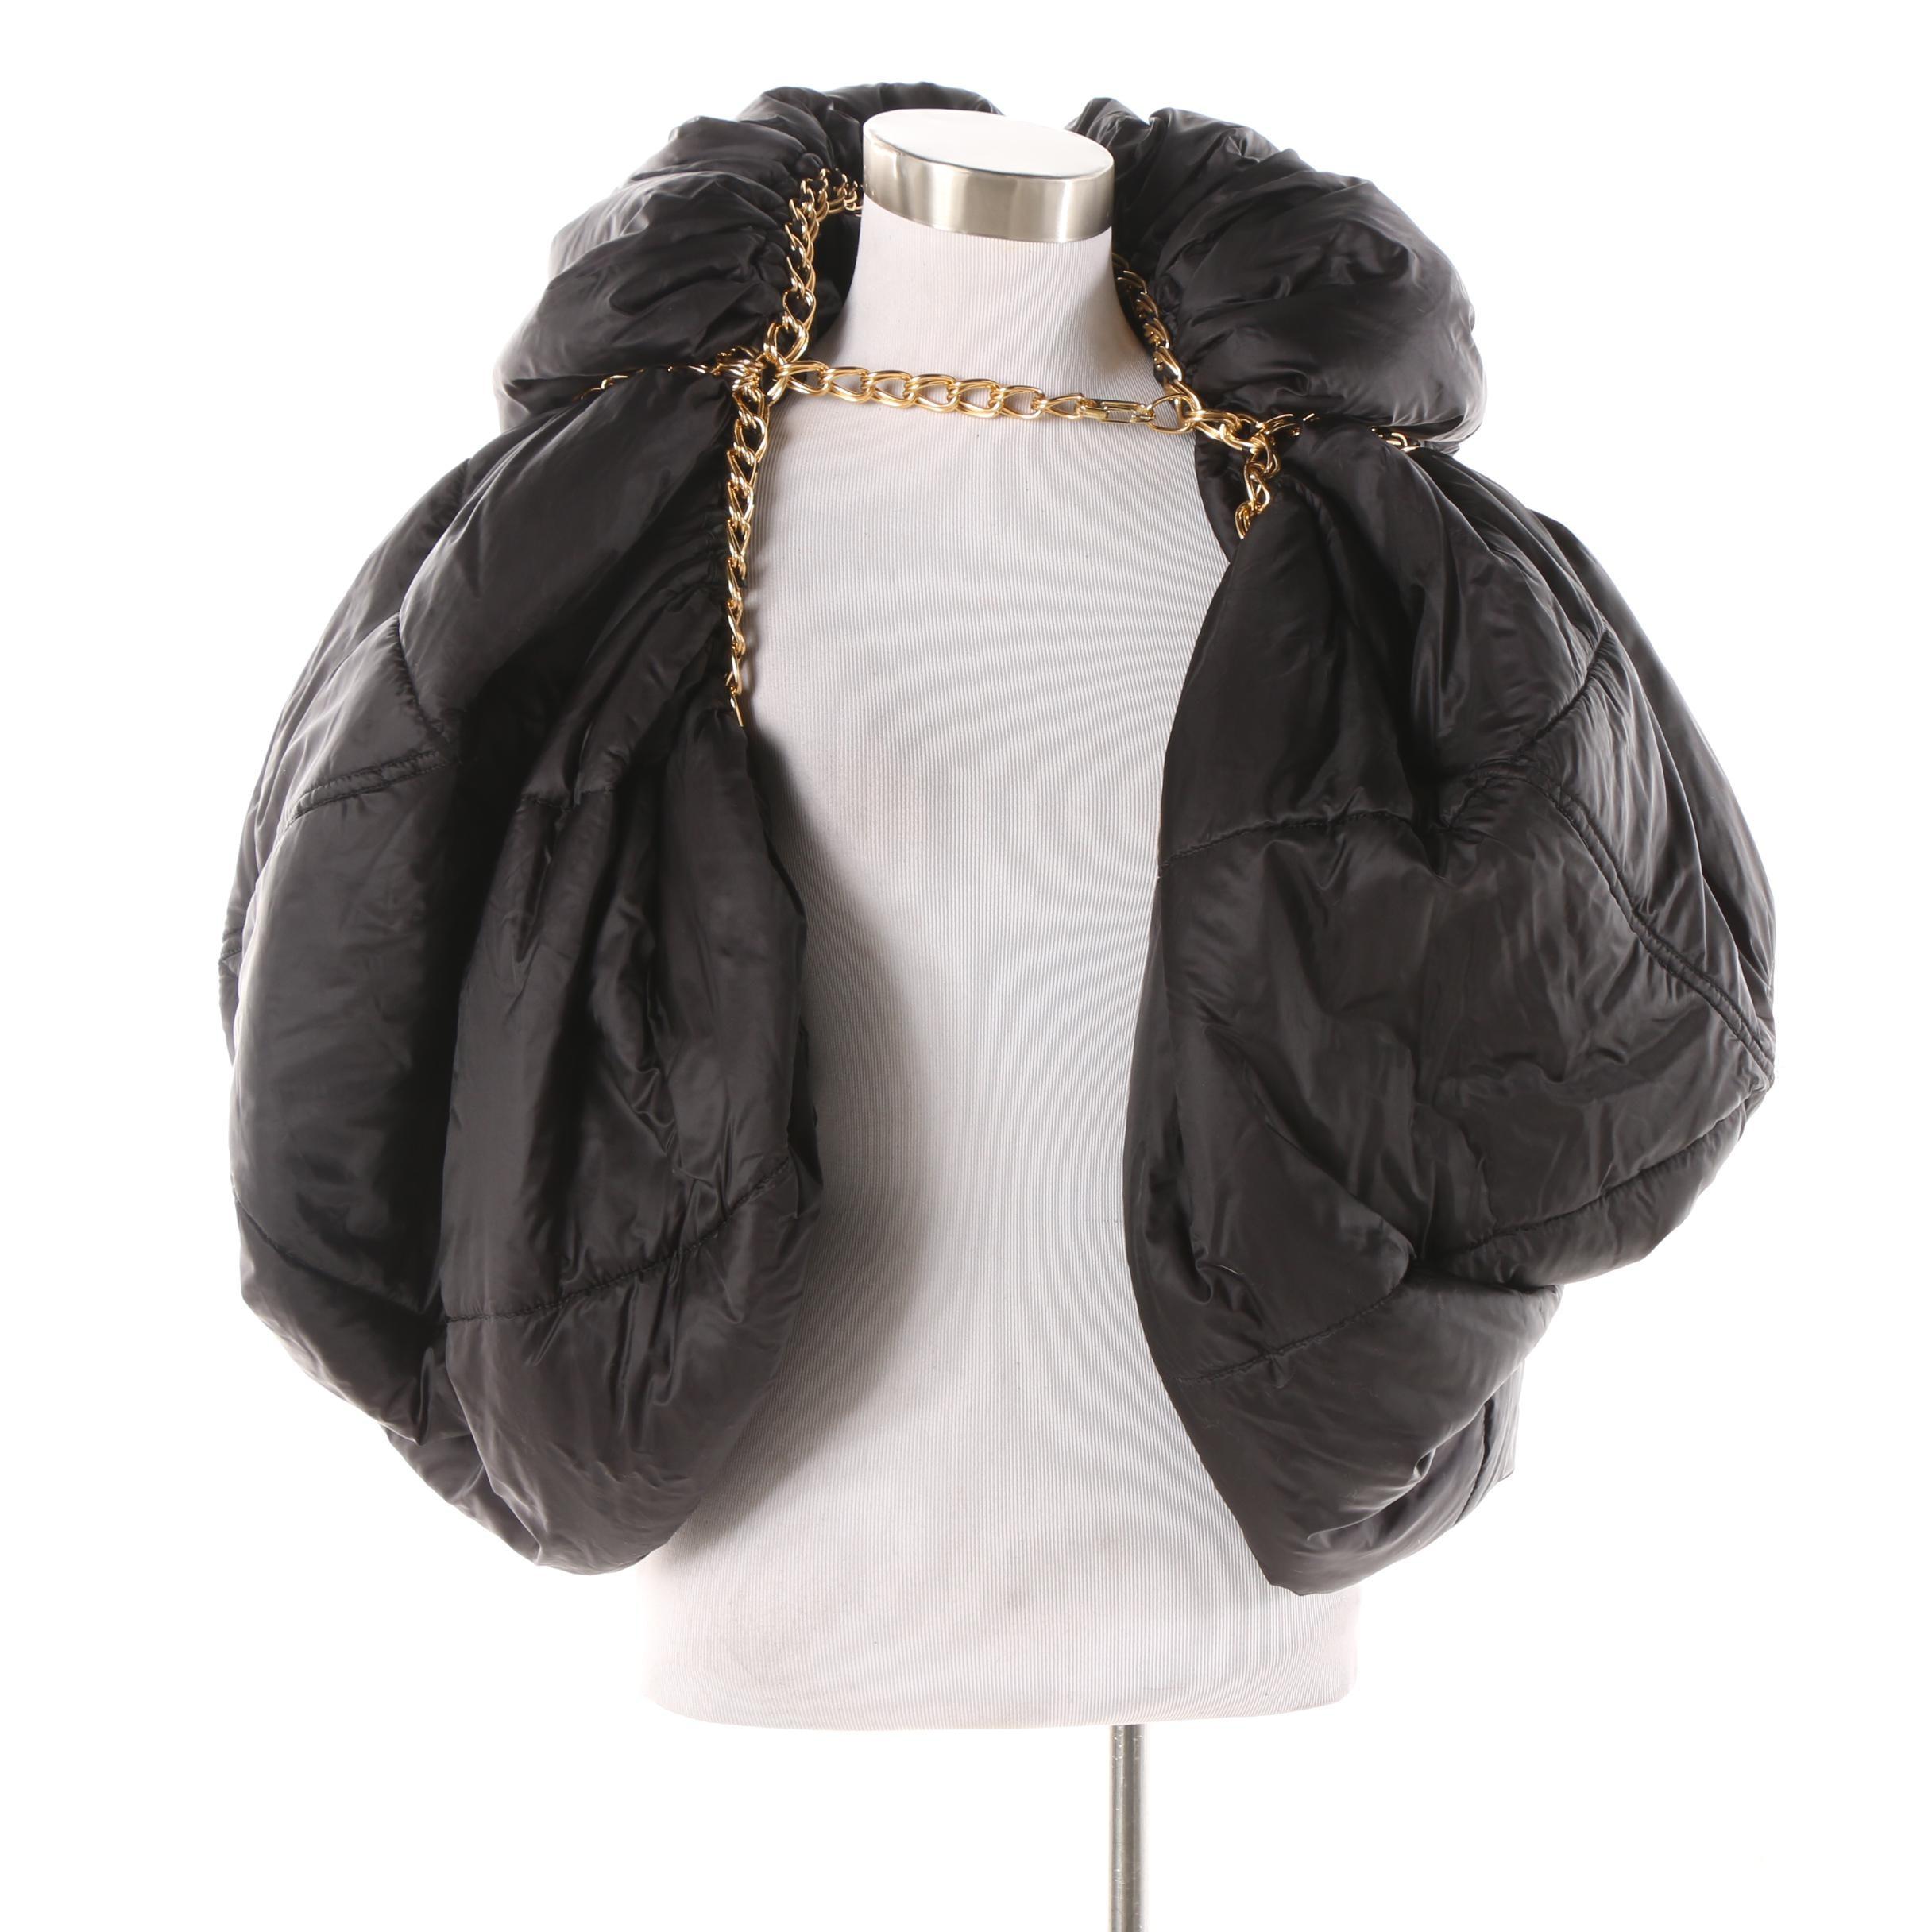 2009 Junya Watanabe Comme des Garçons Runway Black Puffer Vest with Chains